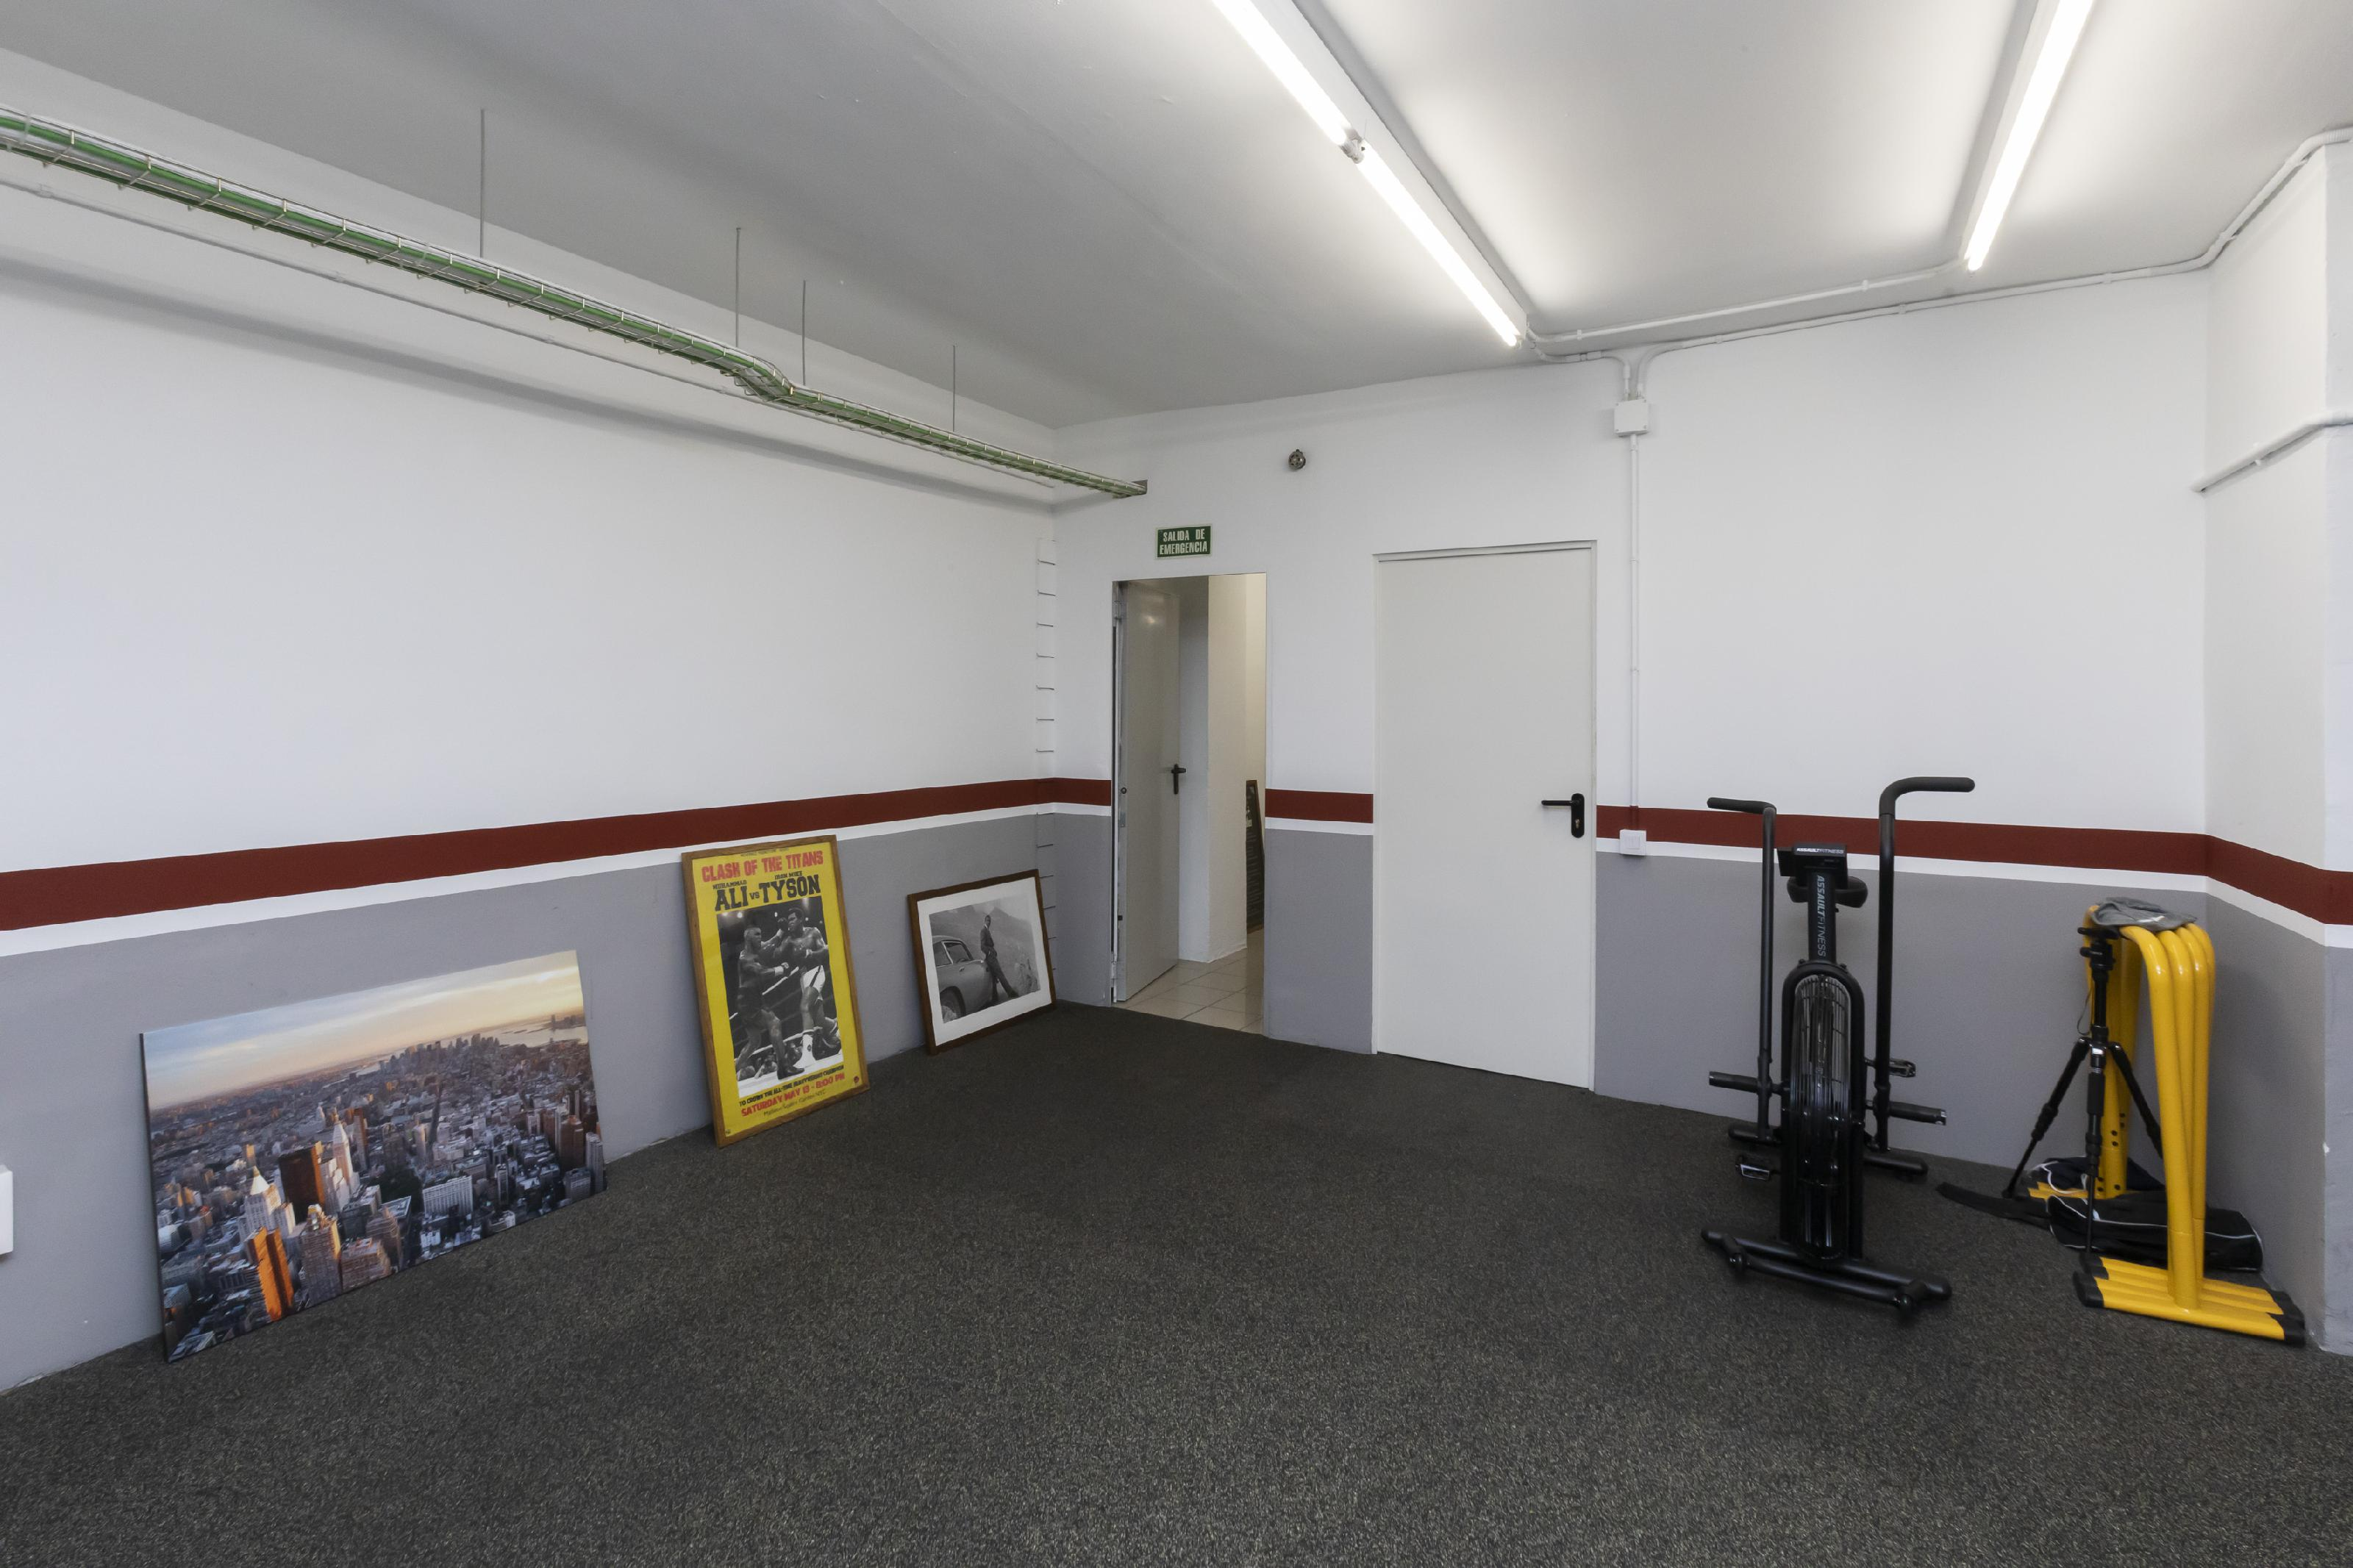 249493 Commercial premises for sale in Sarrià-Sant Gervasi, Sant Gervasi-Galvany 10